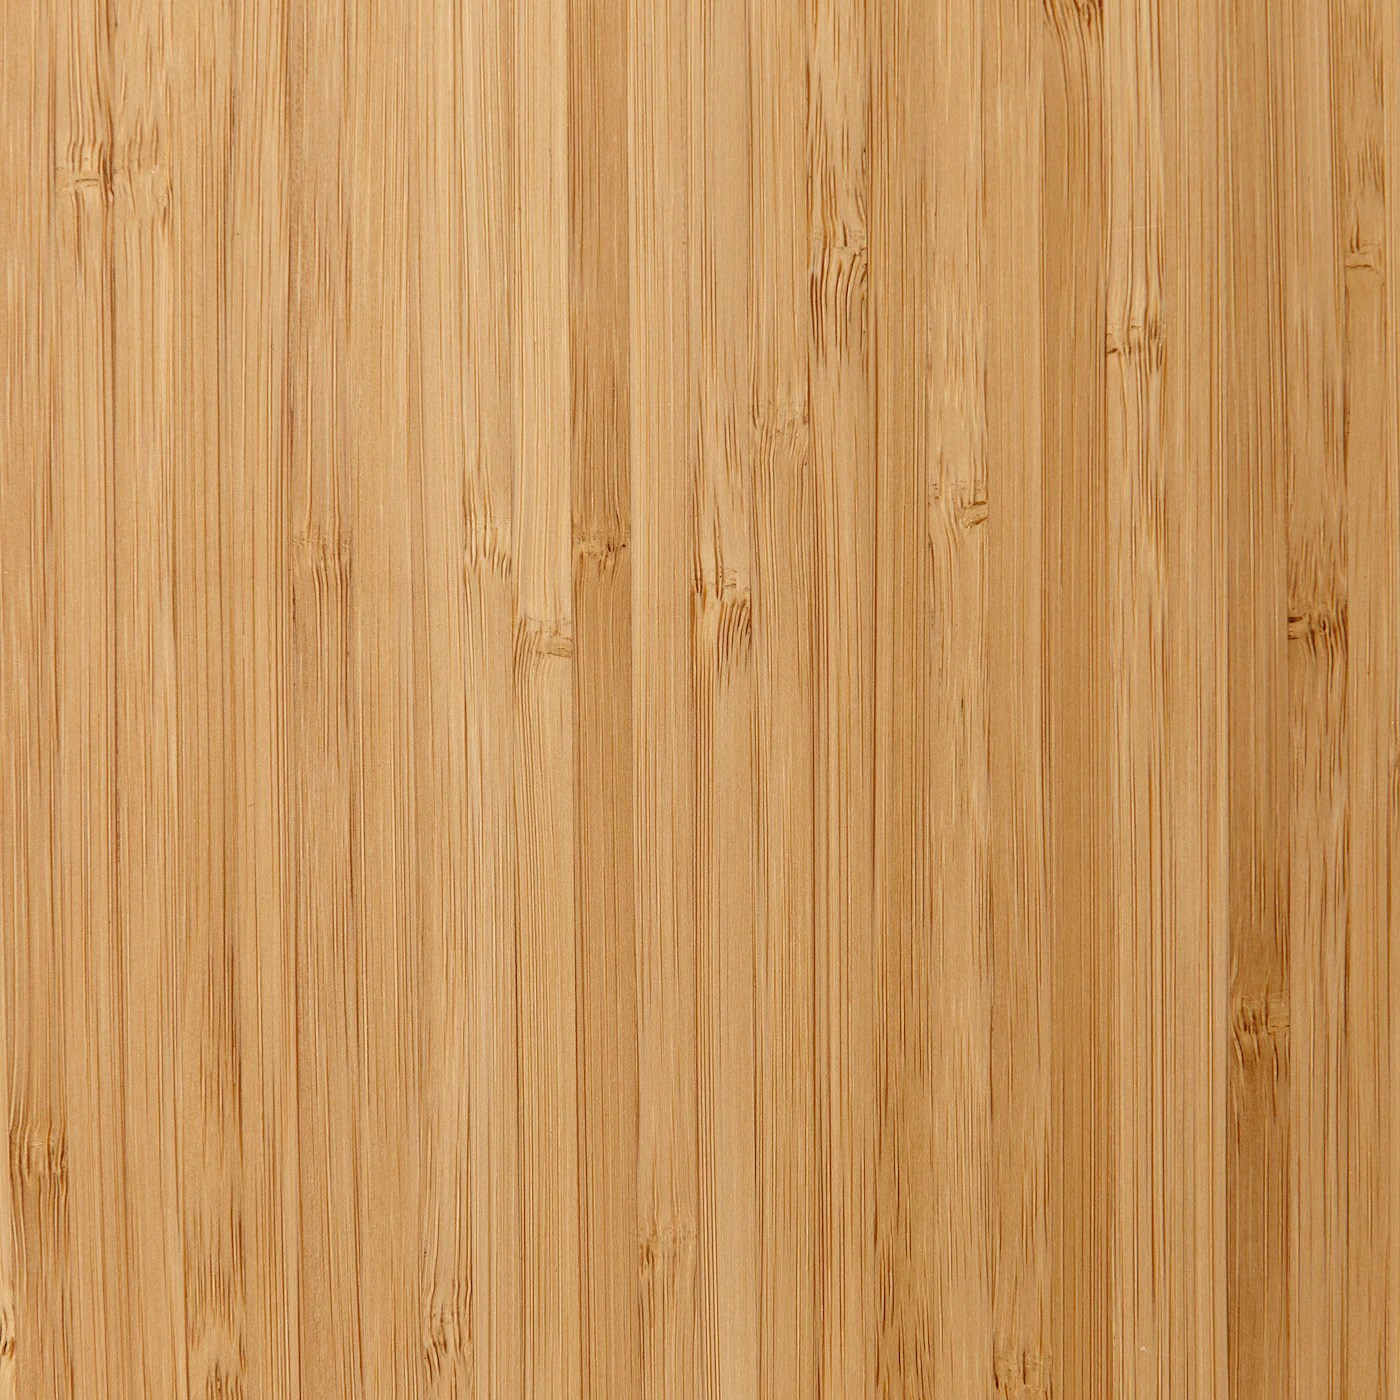 Tolken Plateau Bambou 142x49 Cm Ikea